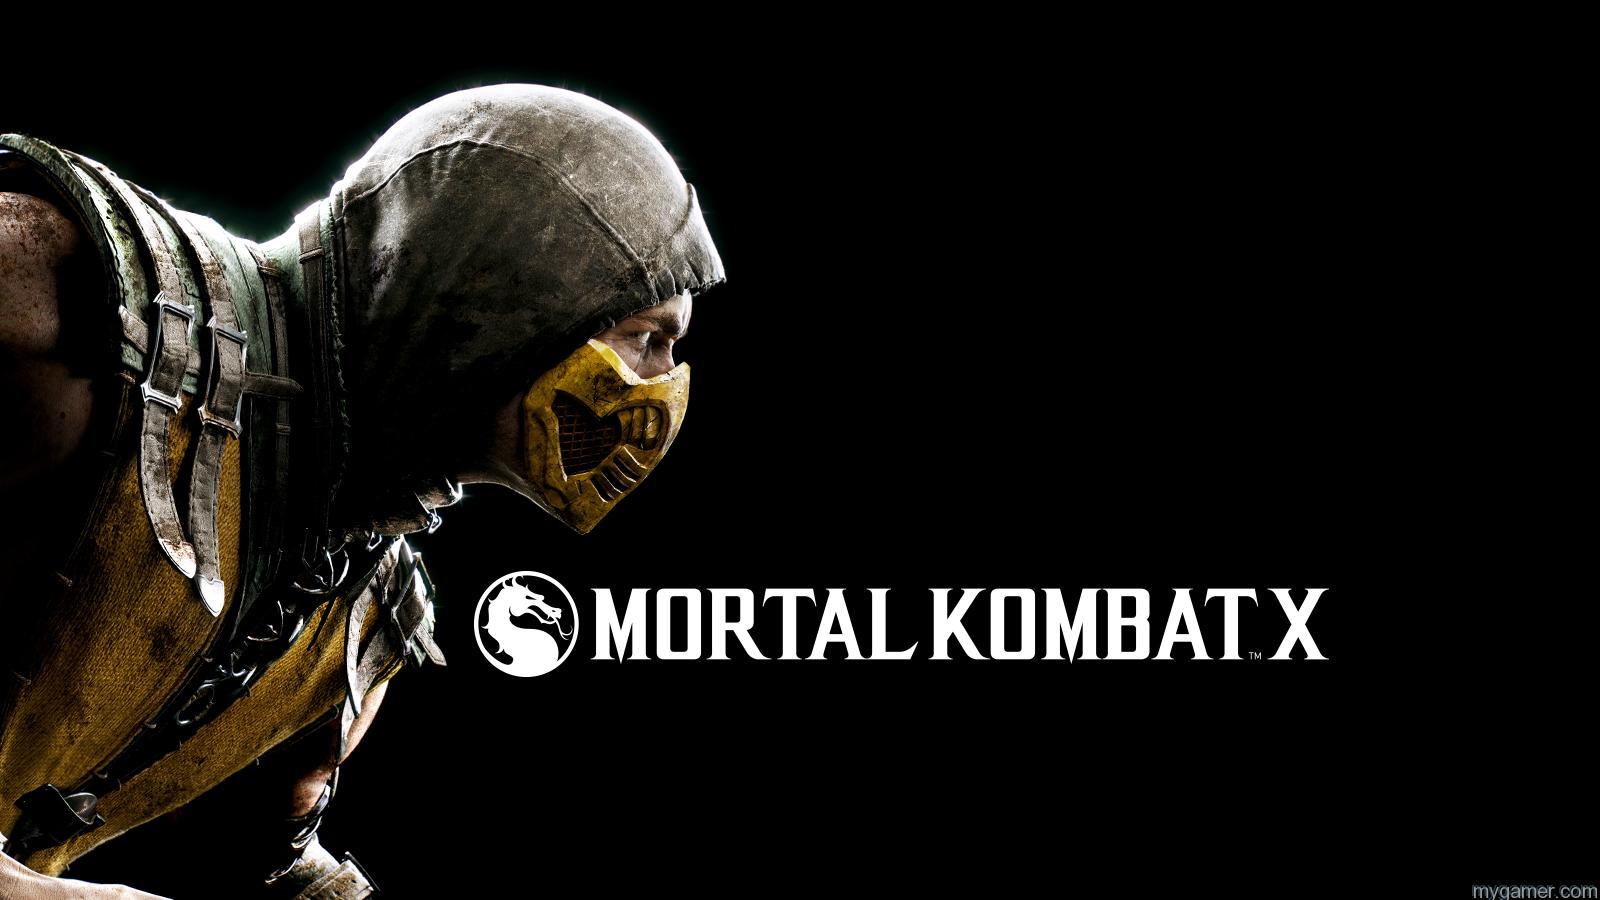 Mortal Kombat X Mortal Kombat X Preview Mortal Kombat X Preview Mortal Kombat X